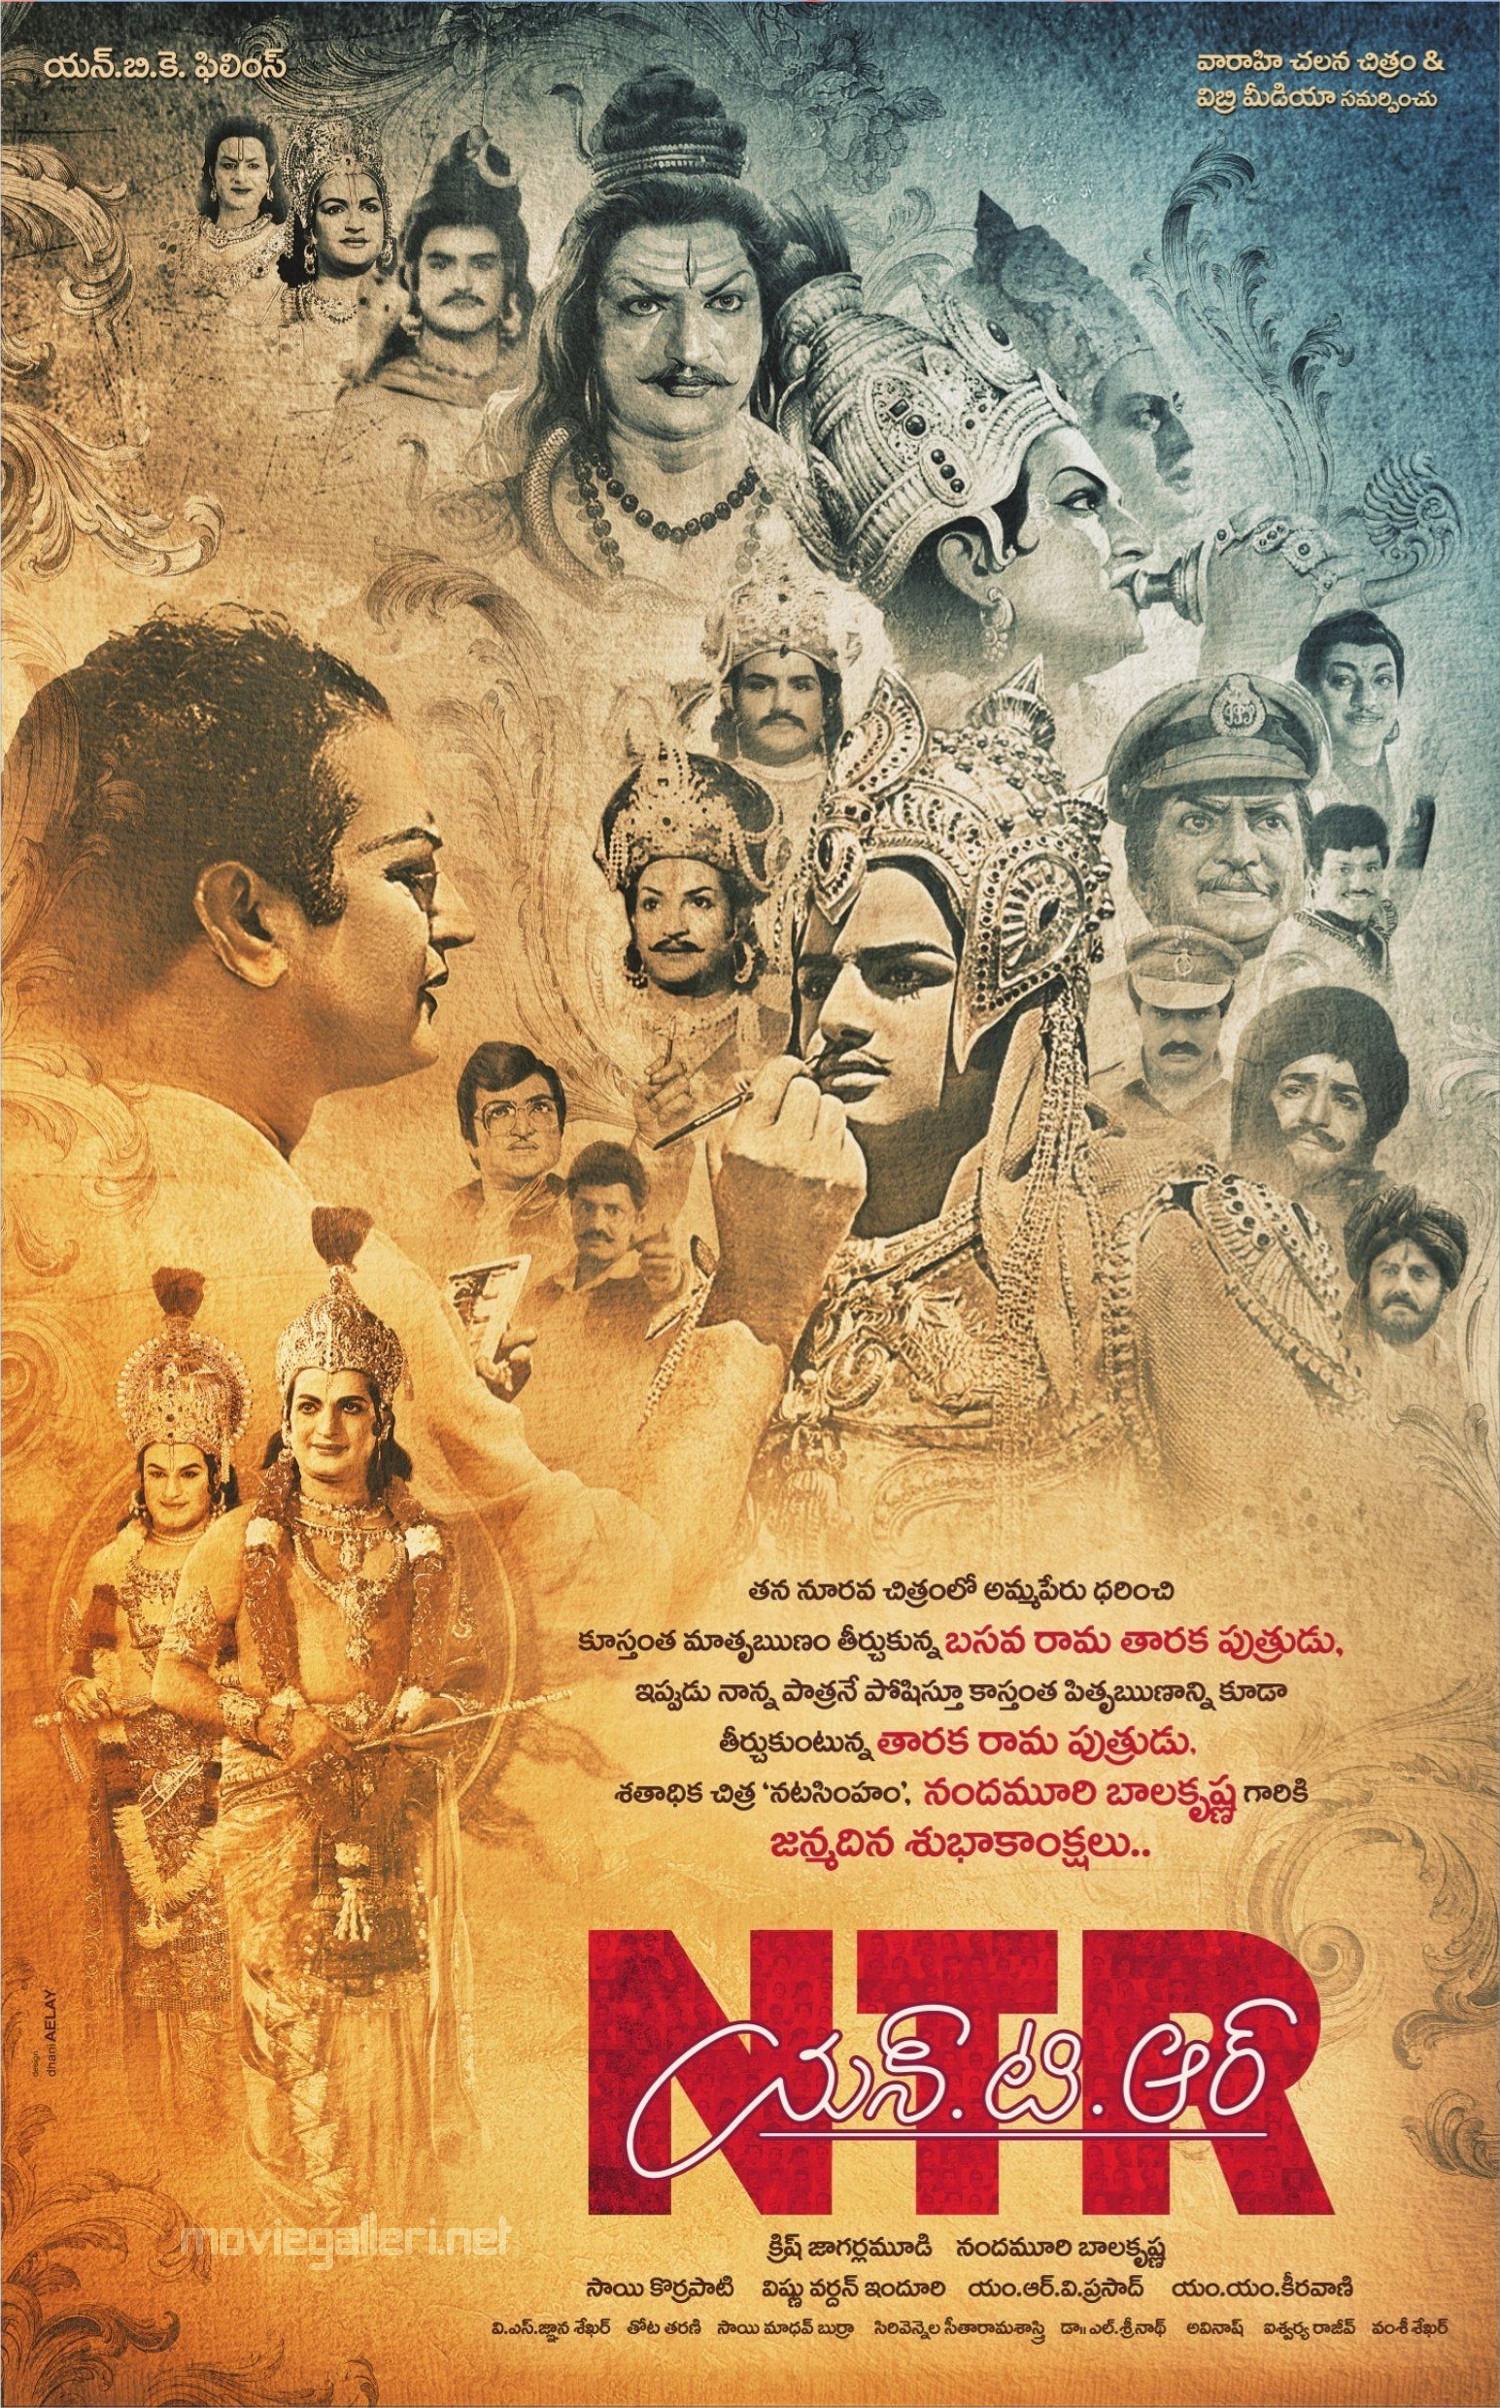 Nandamuri Balakrishna Birthday Poster from NTR Biopic Movie Team